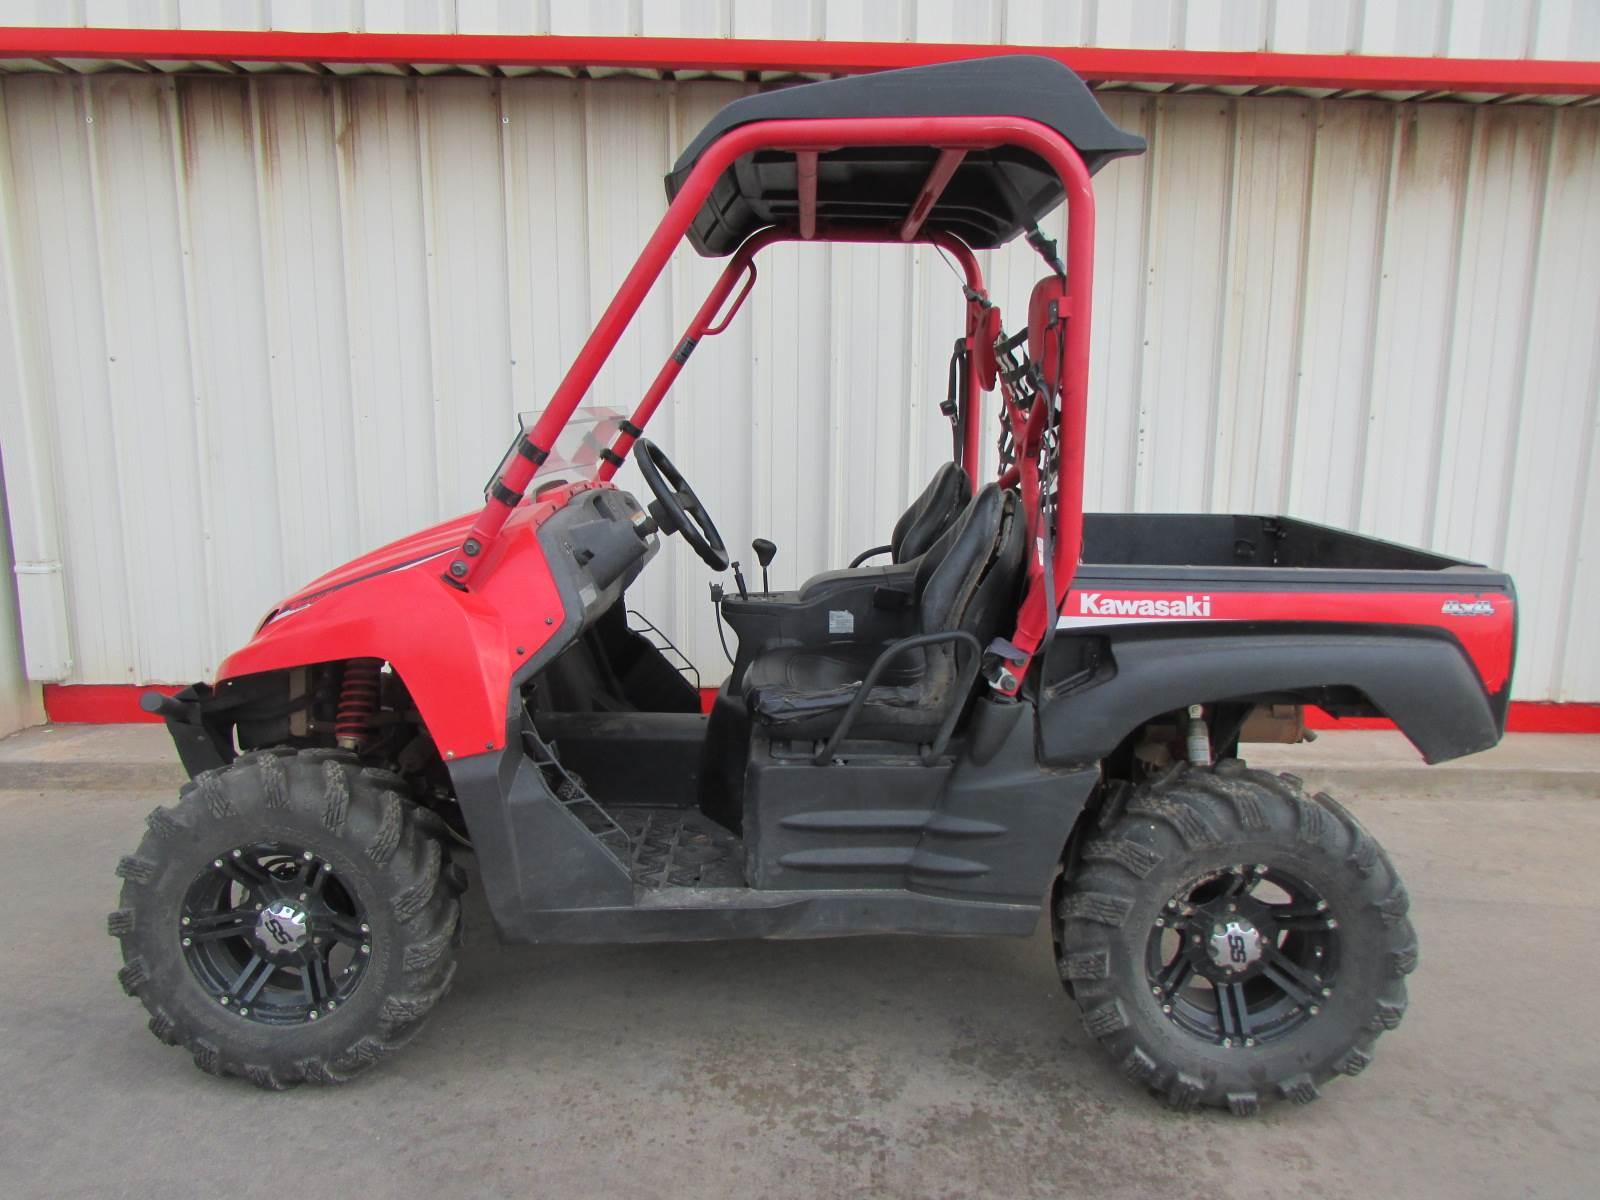 Used 2008 Kawasaki Teryx™ 750 4x4 Utility Vehicles in Wichita Falls, TX